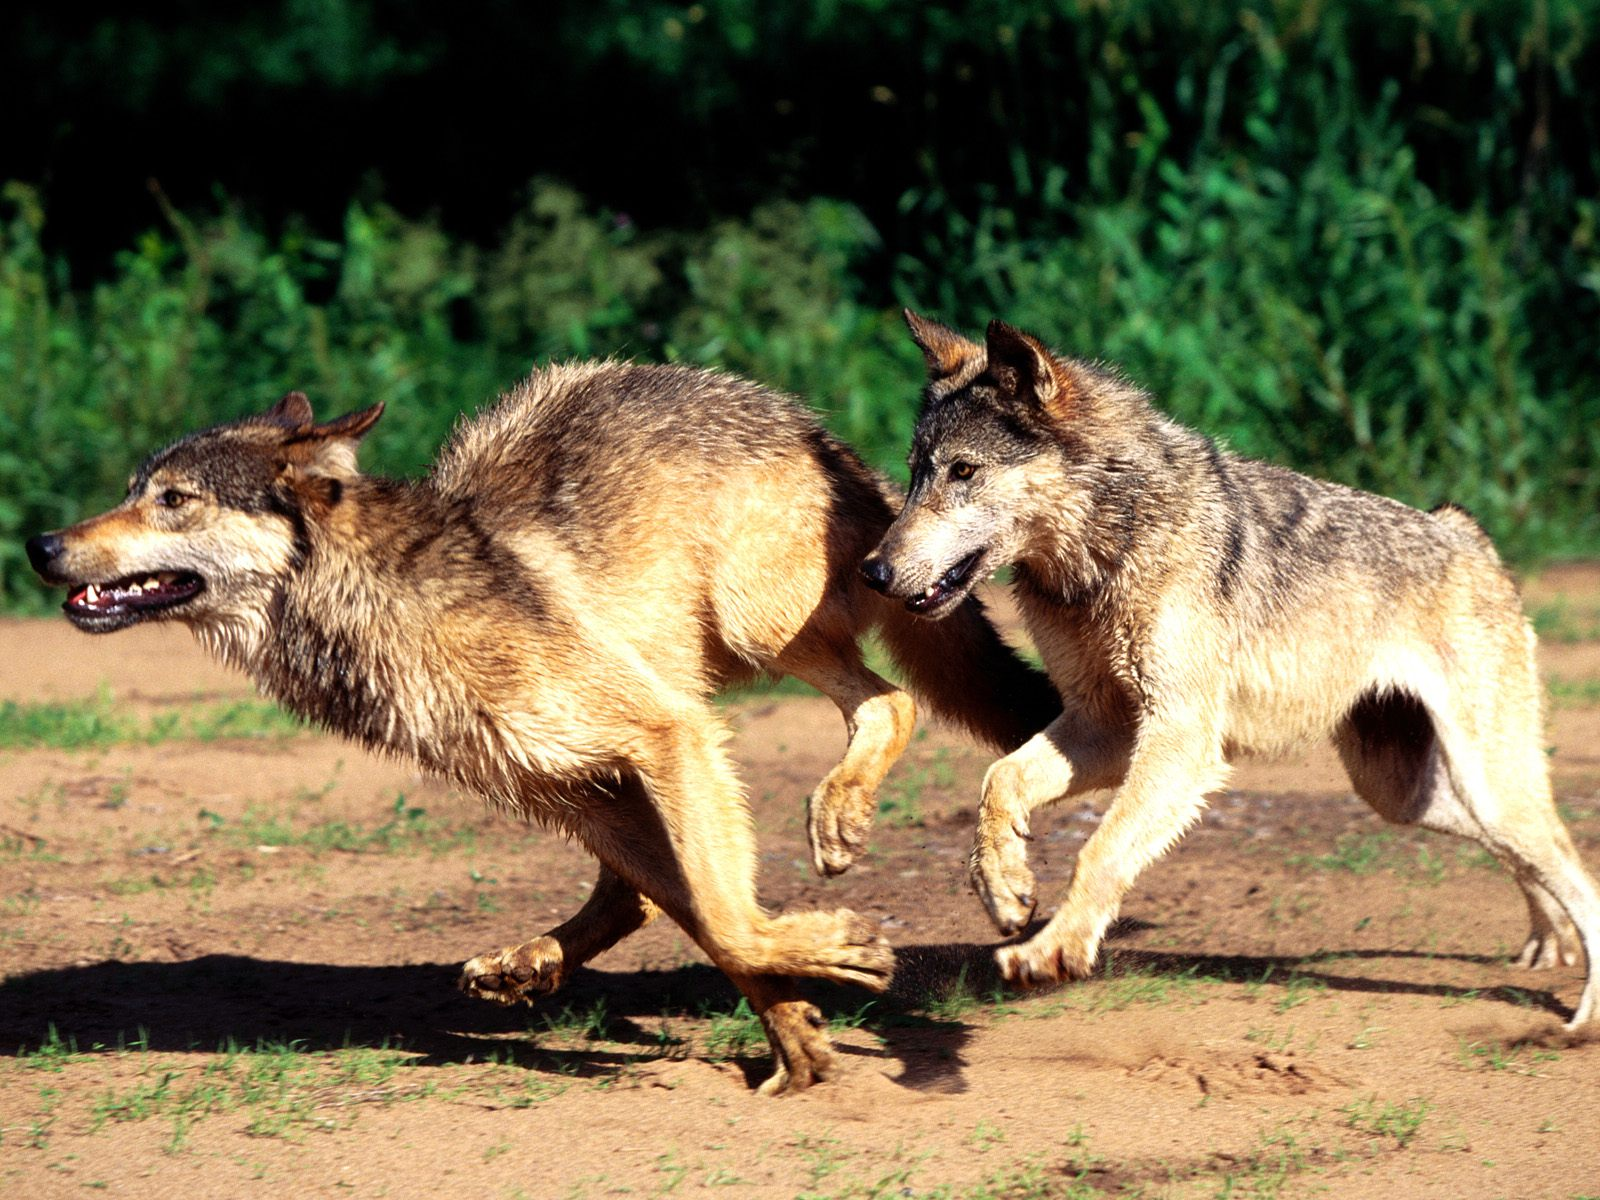 Wolves: Wolf Delisting Lawsuit